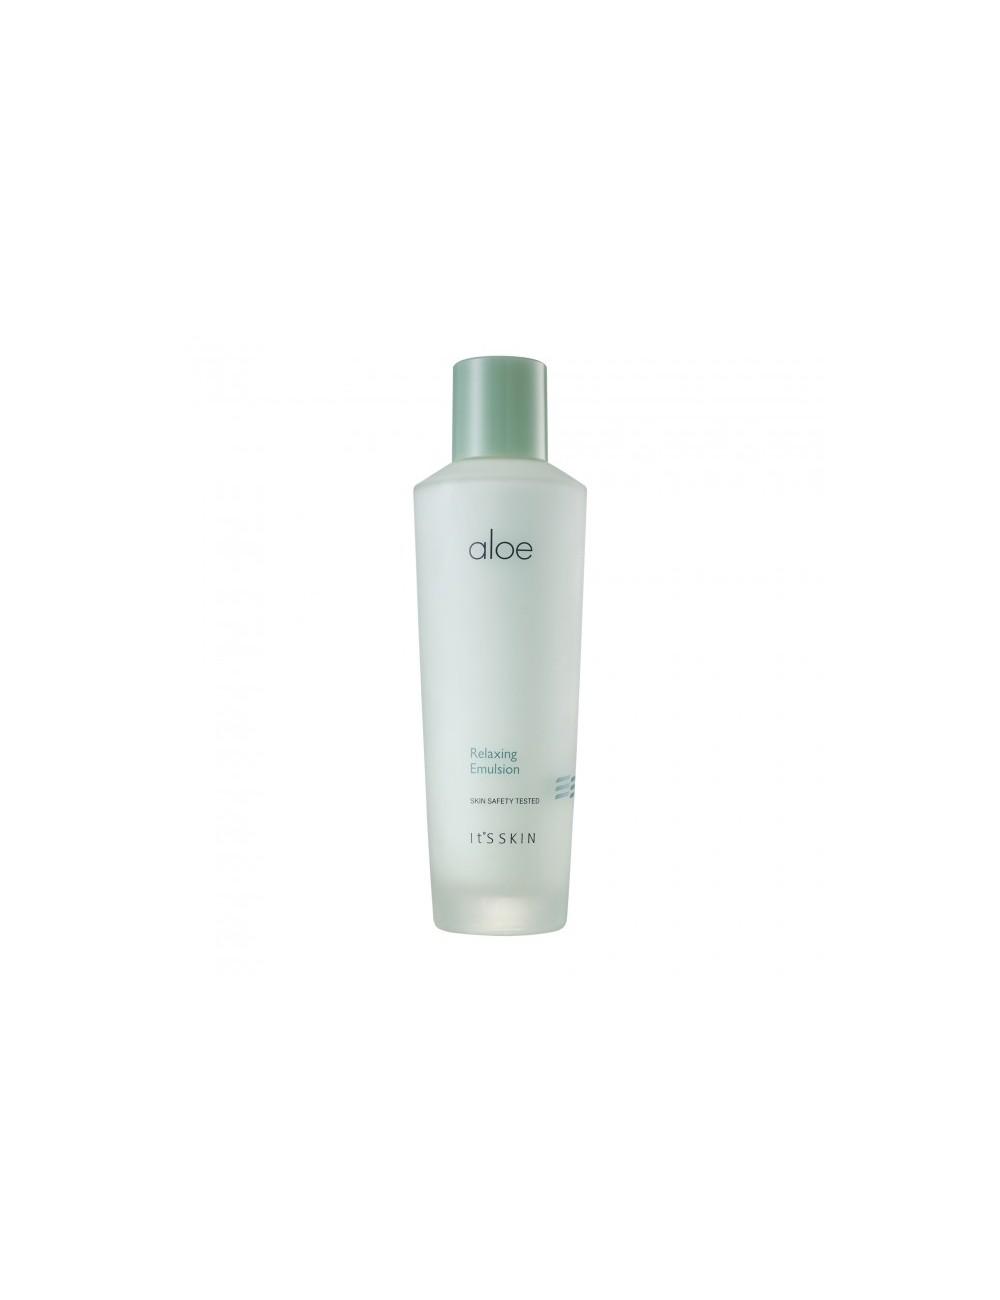 Emulsión Relajante con Aloe Vera It's Skin - Aloe Relaxing Emulsion